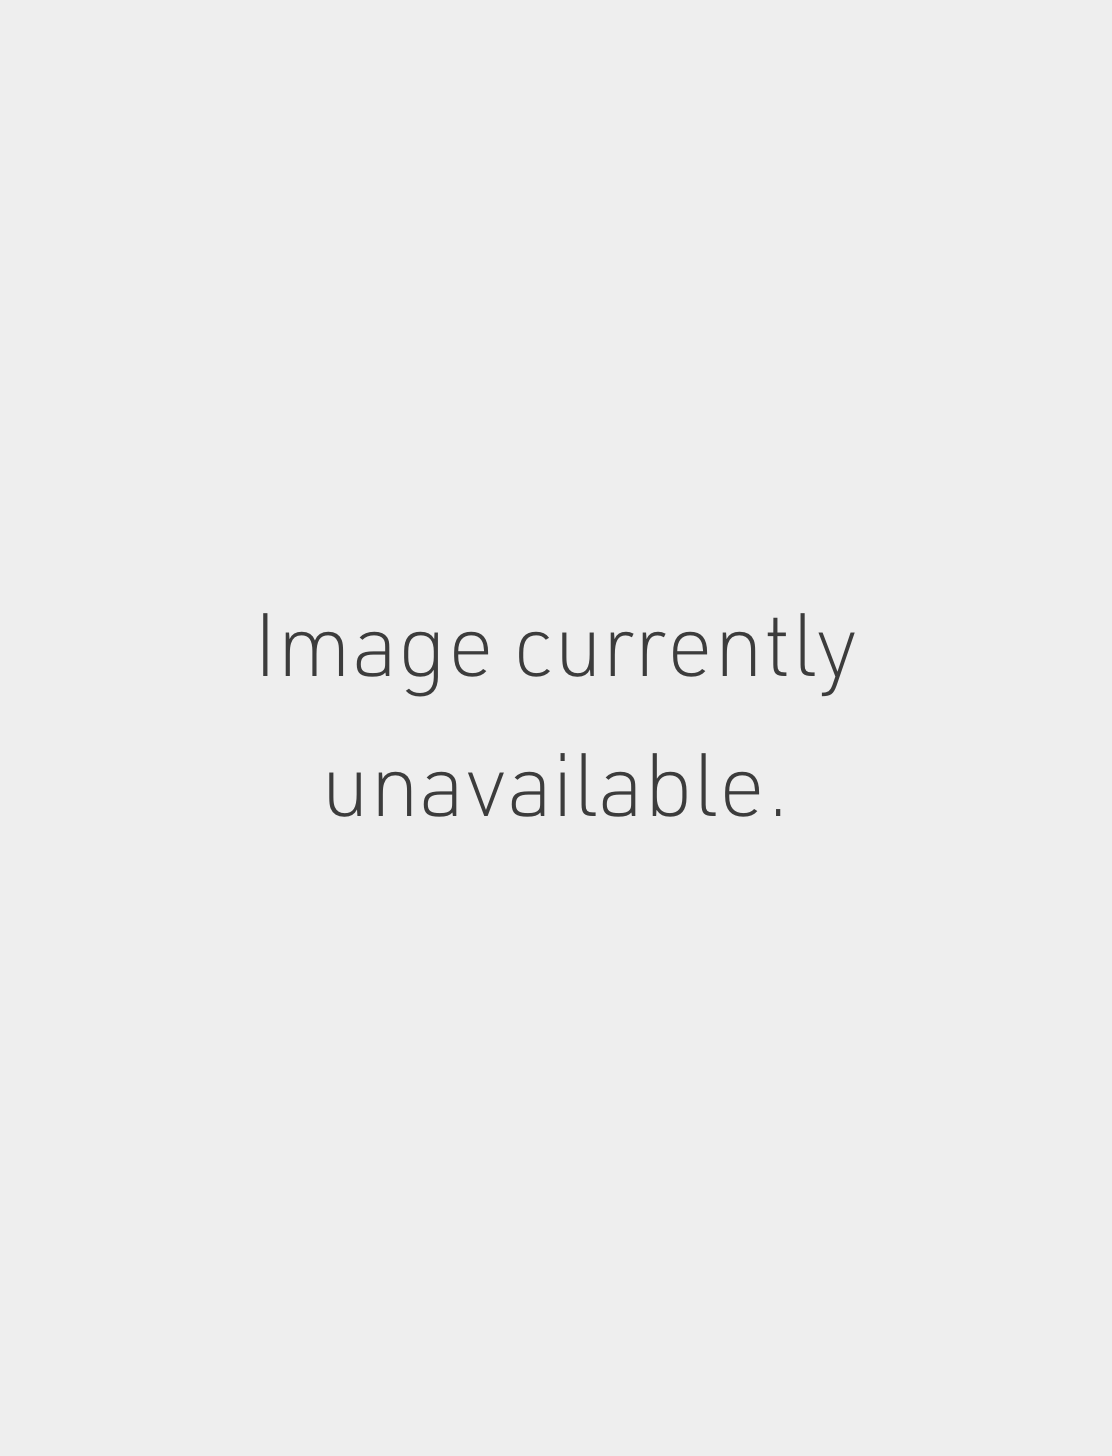 Dala Dangle and Crest Barbell Image #1